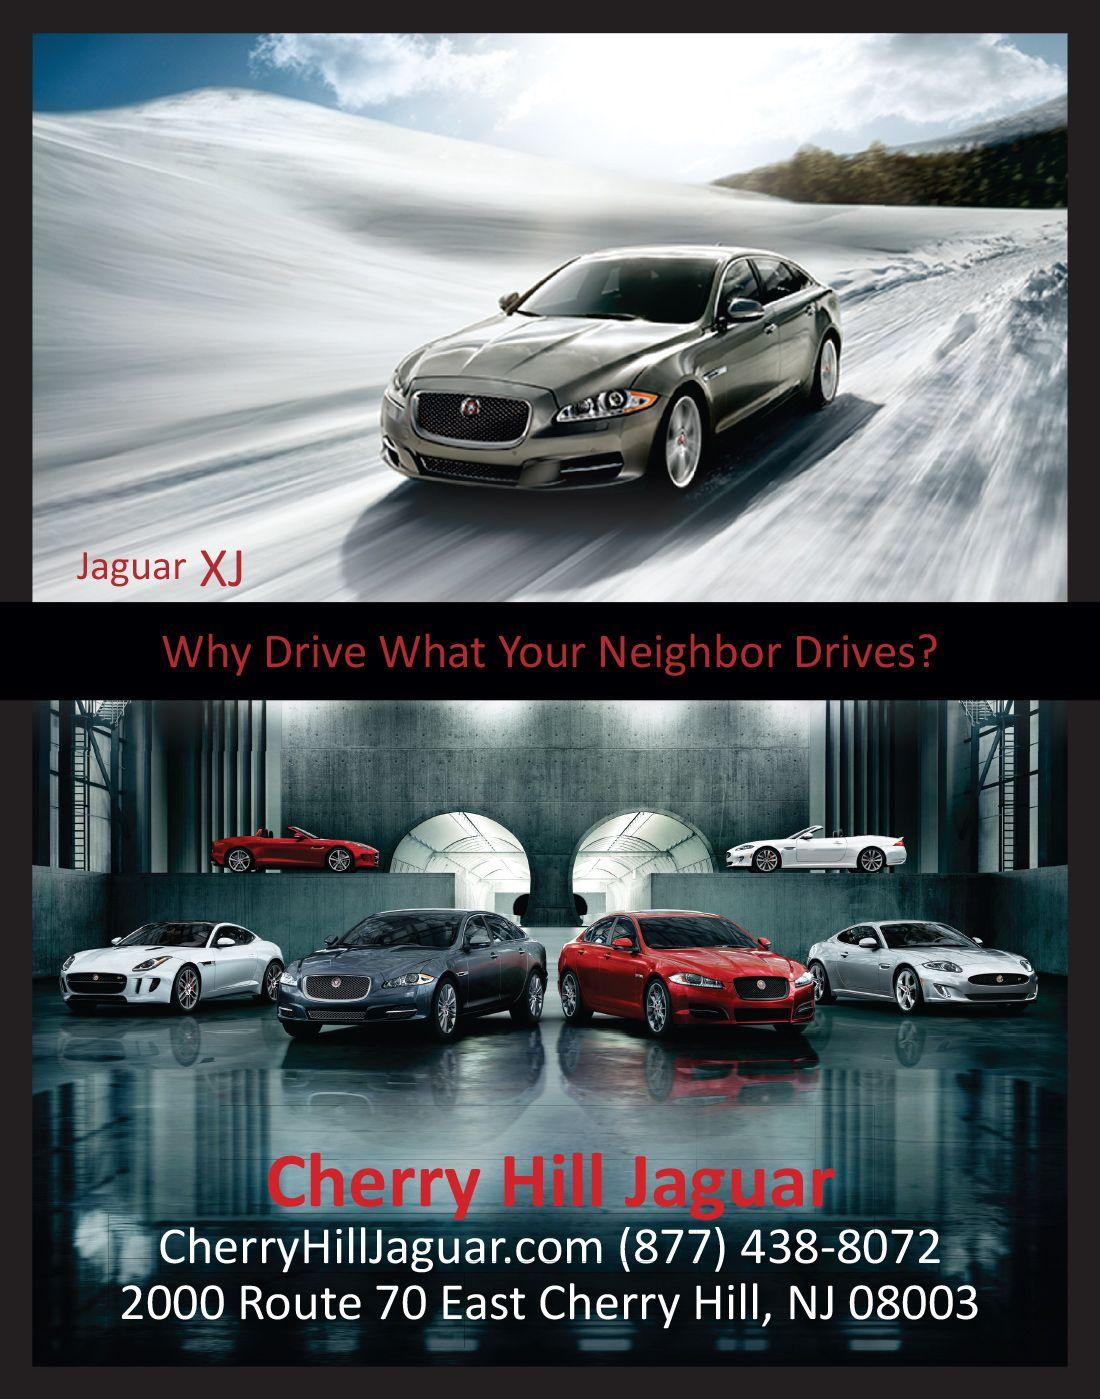 Cherry Hill Jaguar Magazine Ad 1 Compressor